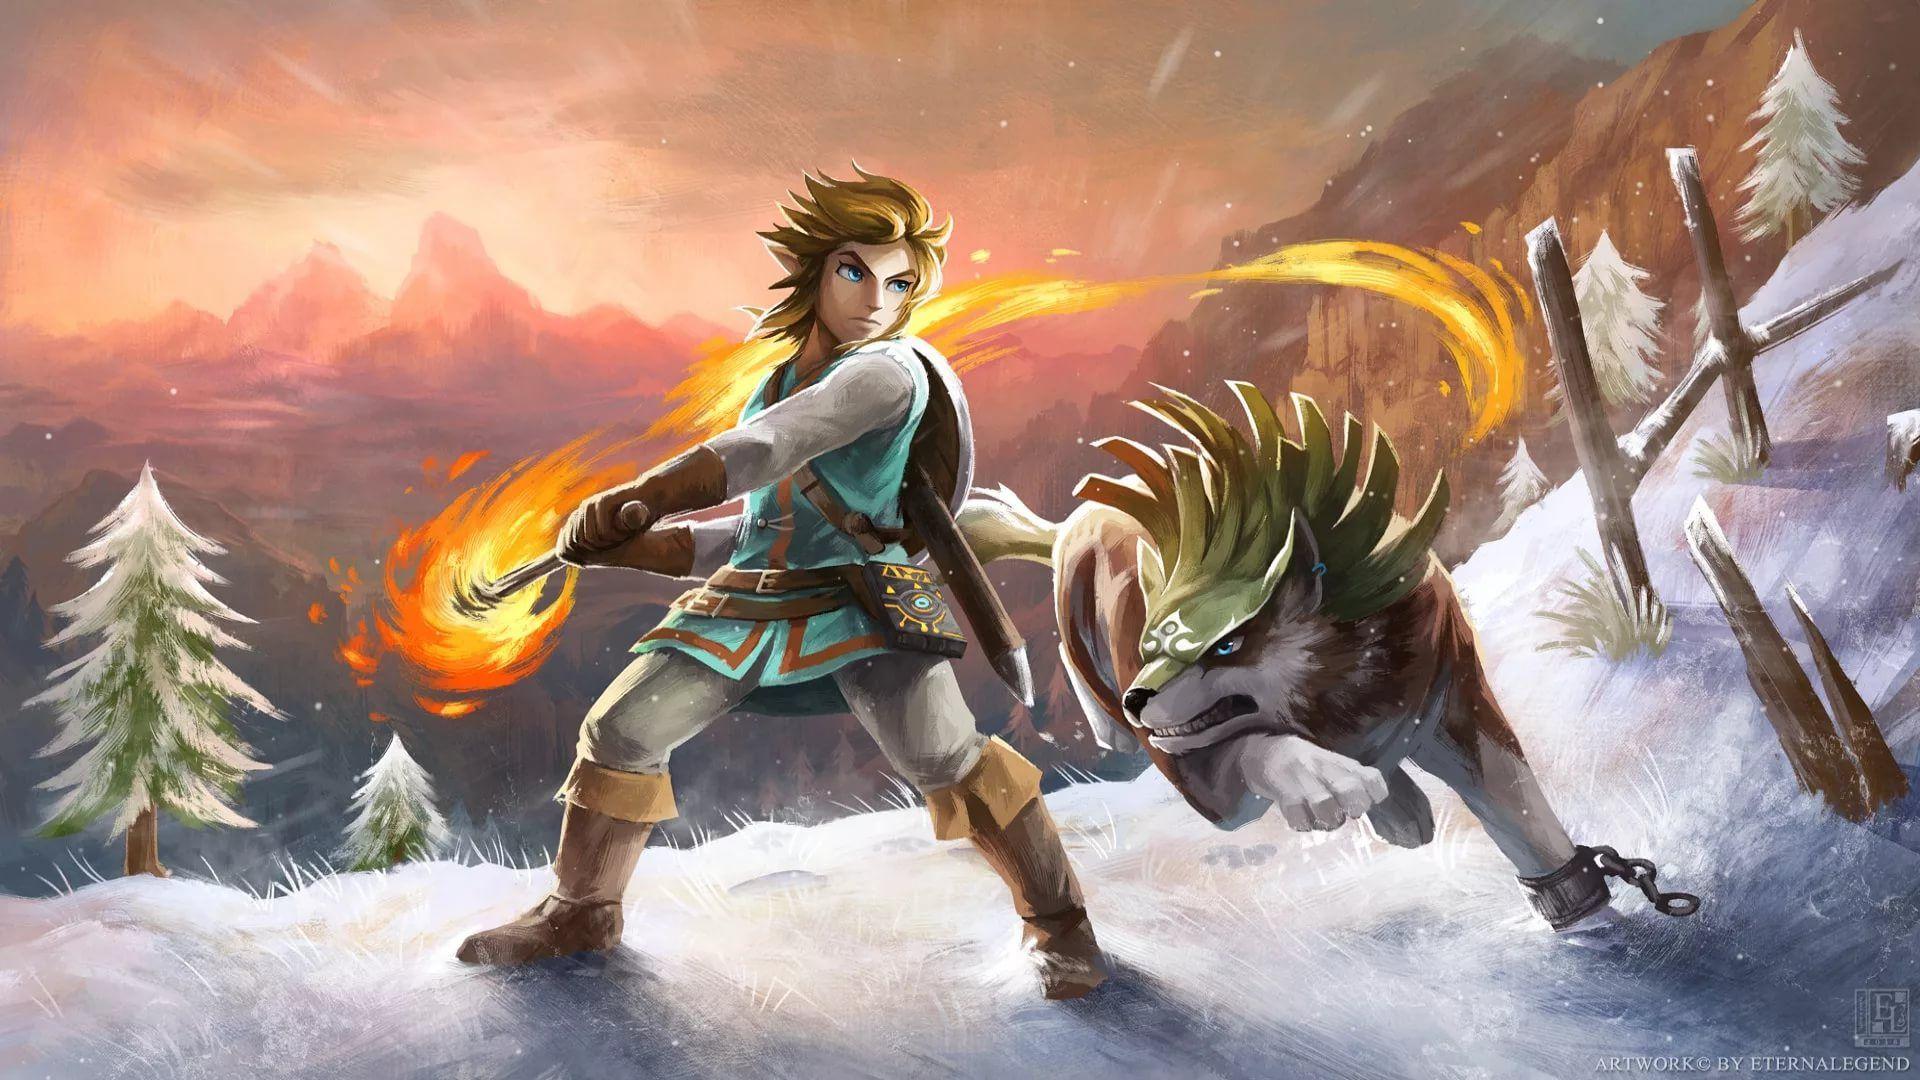 Zelda Live HD 1080 wallpaper